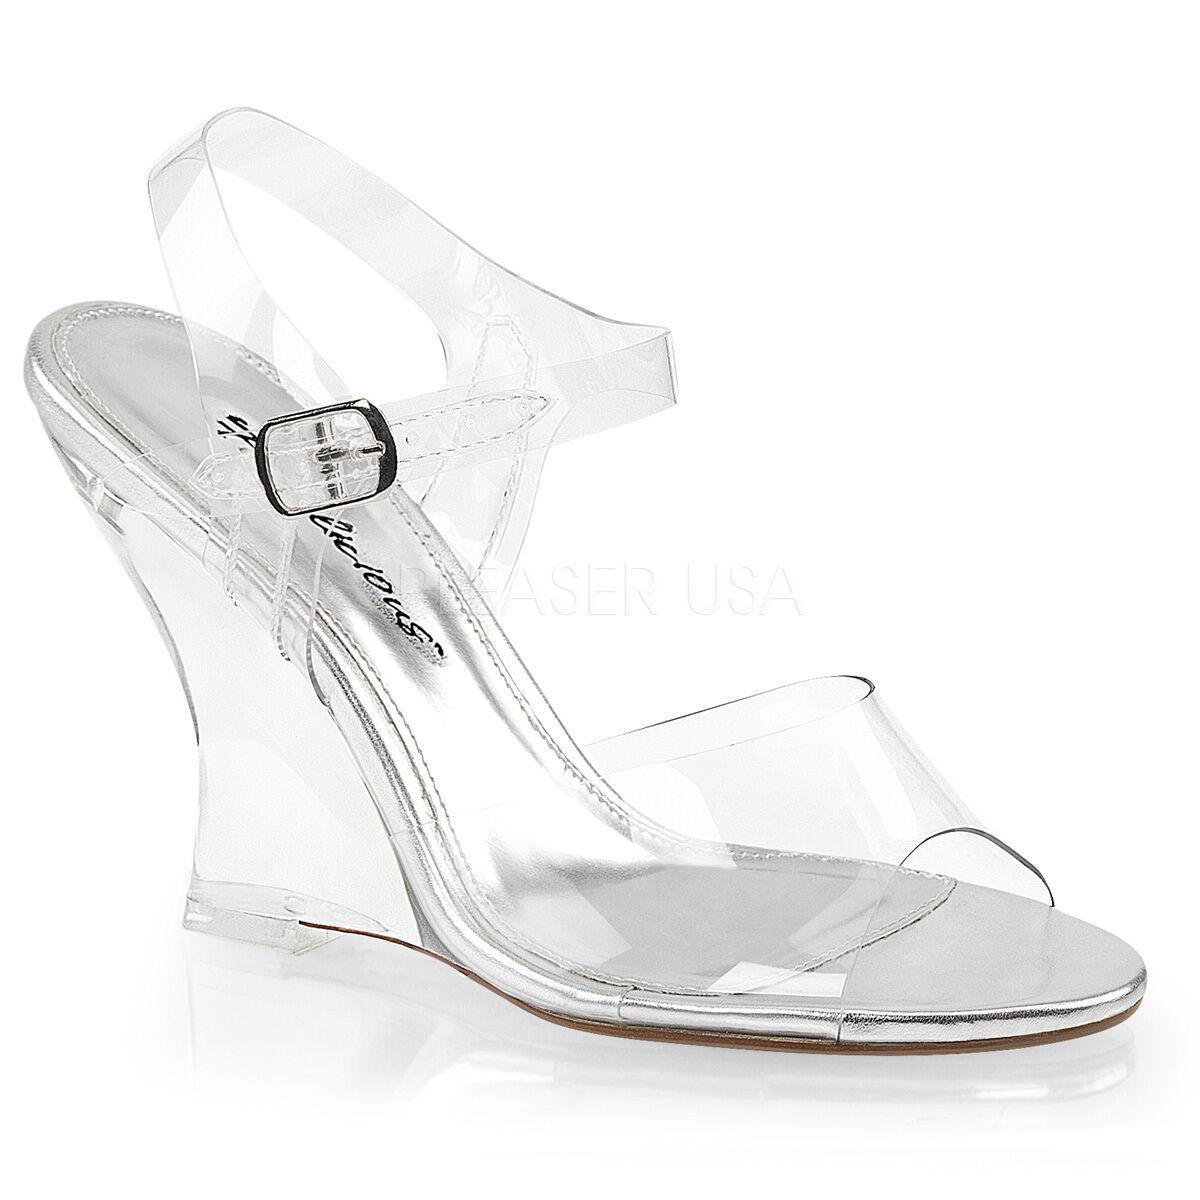 PLEASER Sexy 4  Haut Talons Compenses Prom Pageant Bride Cheville chaussures Sandales LOV408 C M